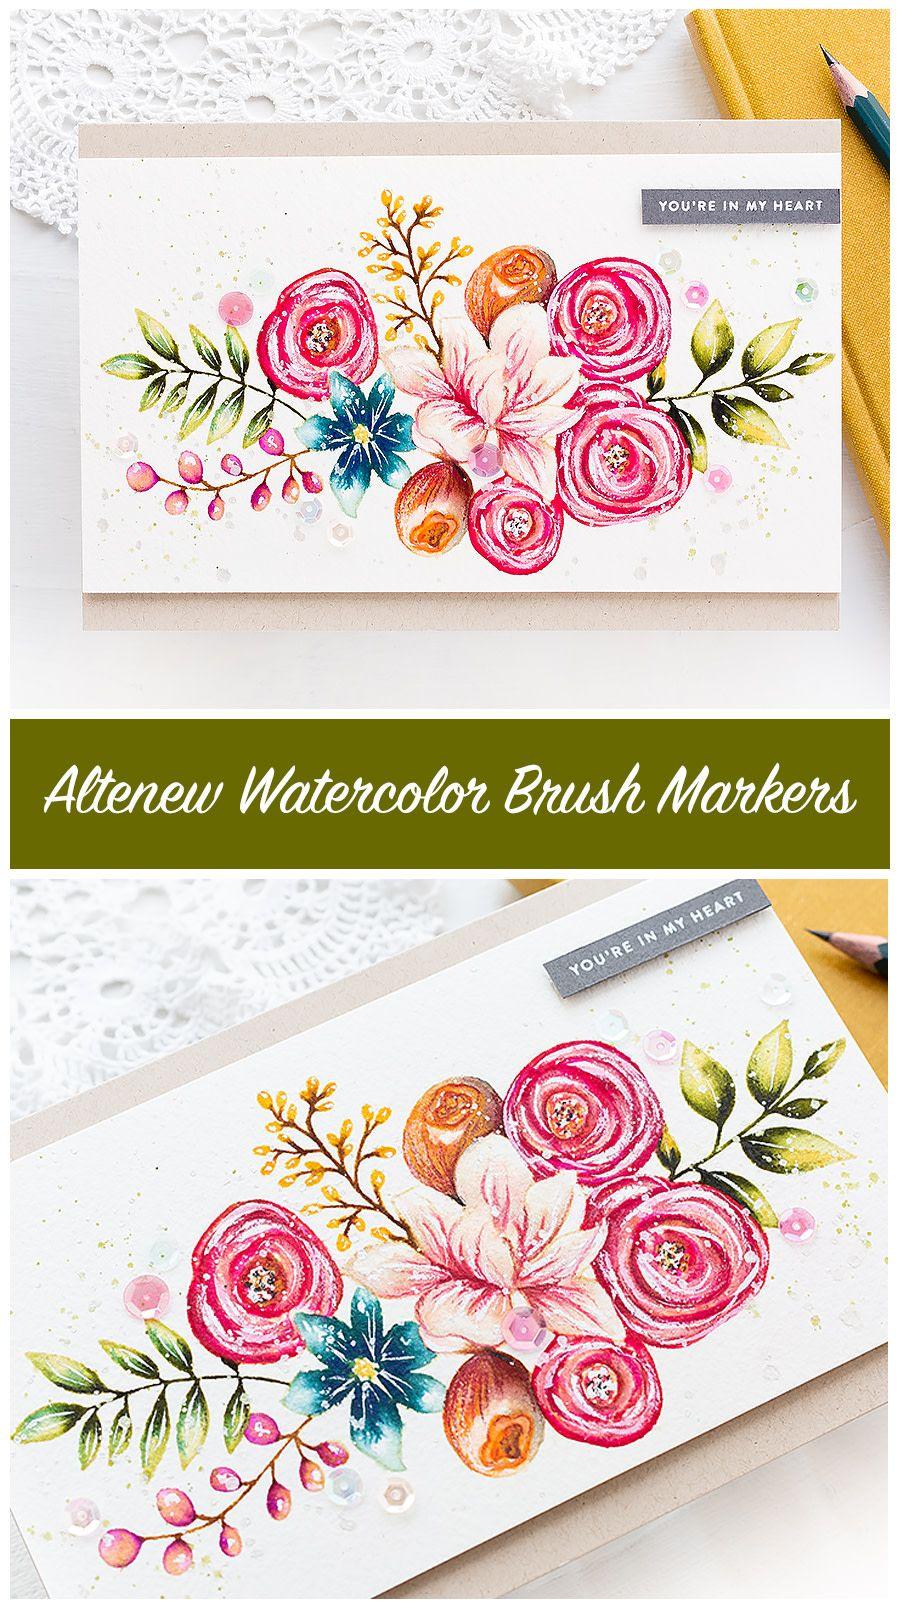 Video Altenew Watercolor Brush Markers Watercolor Cards